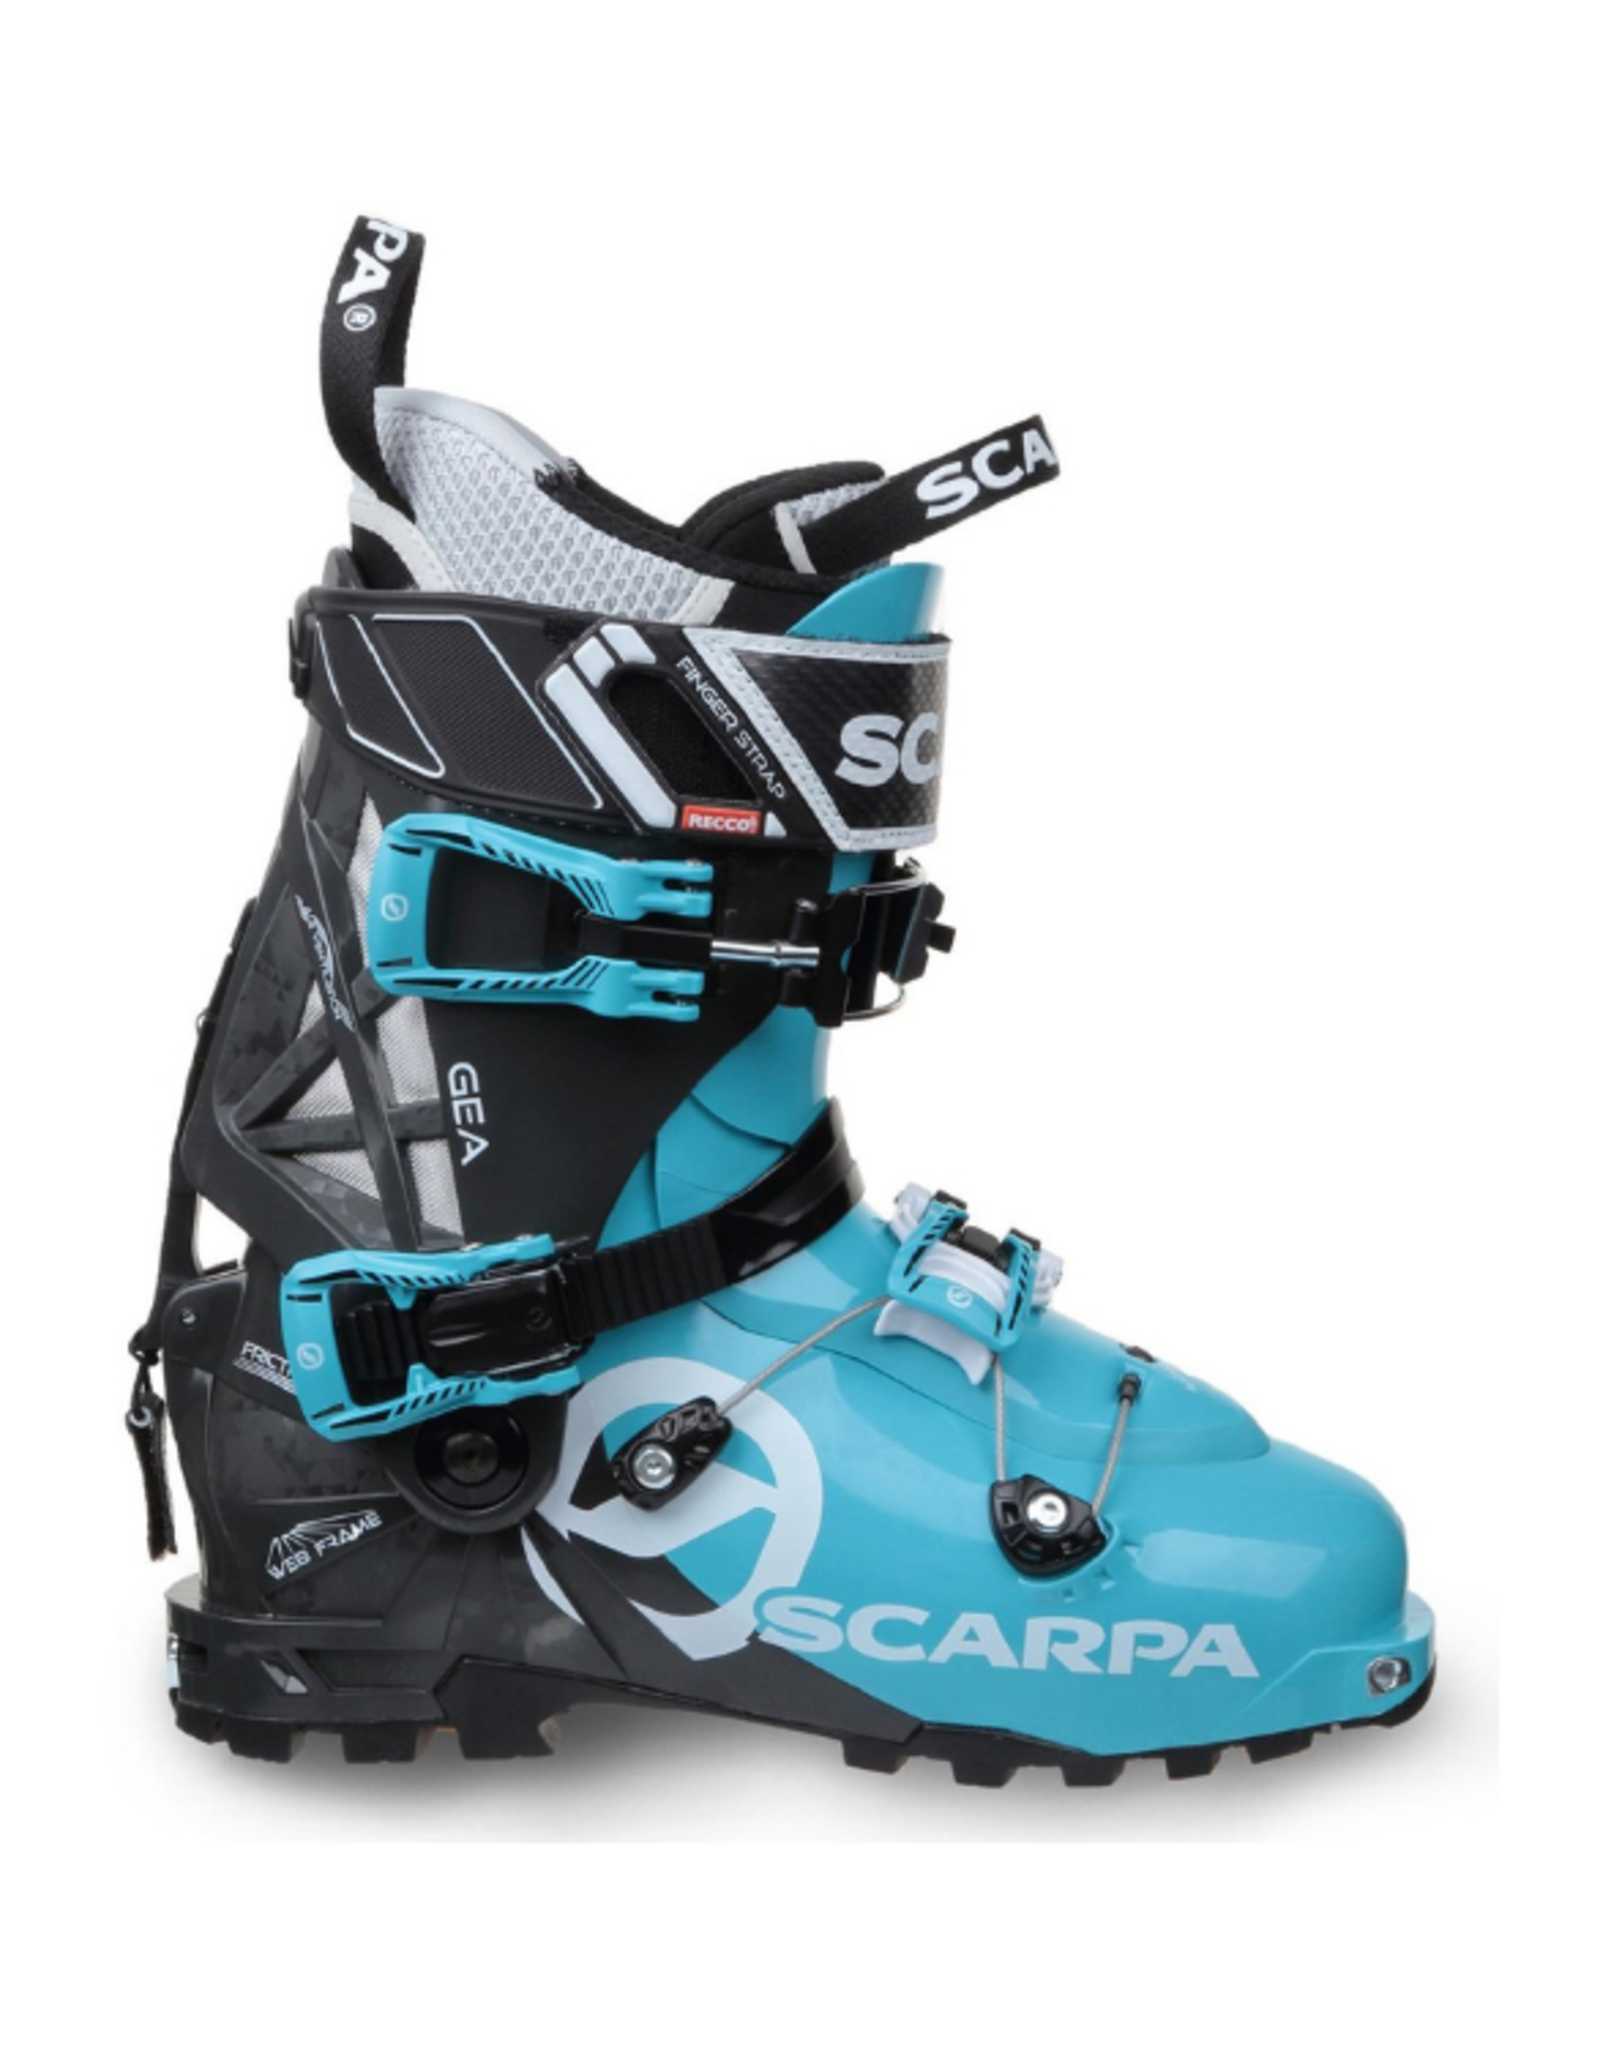 Scarpa Scarpa 2021 Gea Women's AT Ski Boots